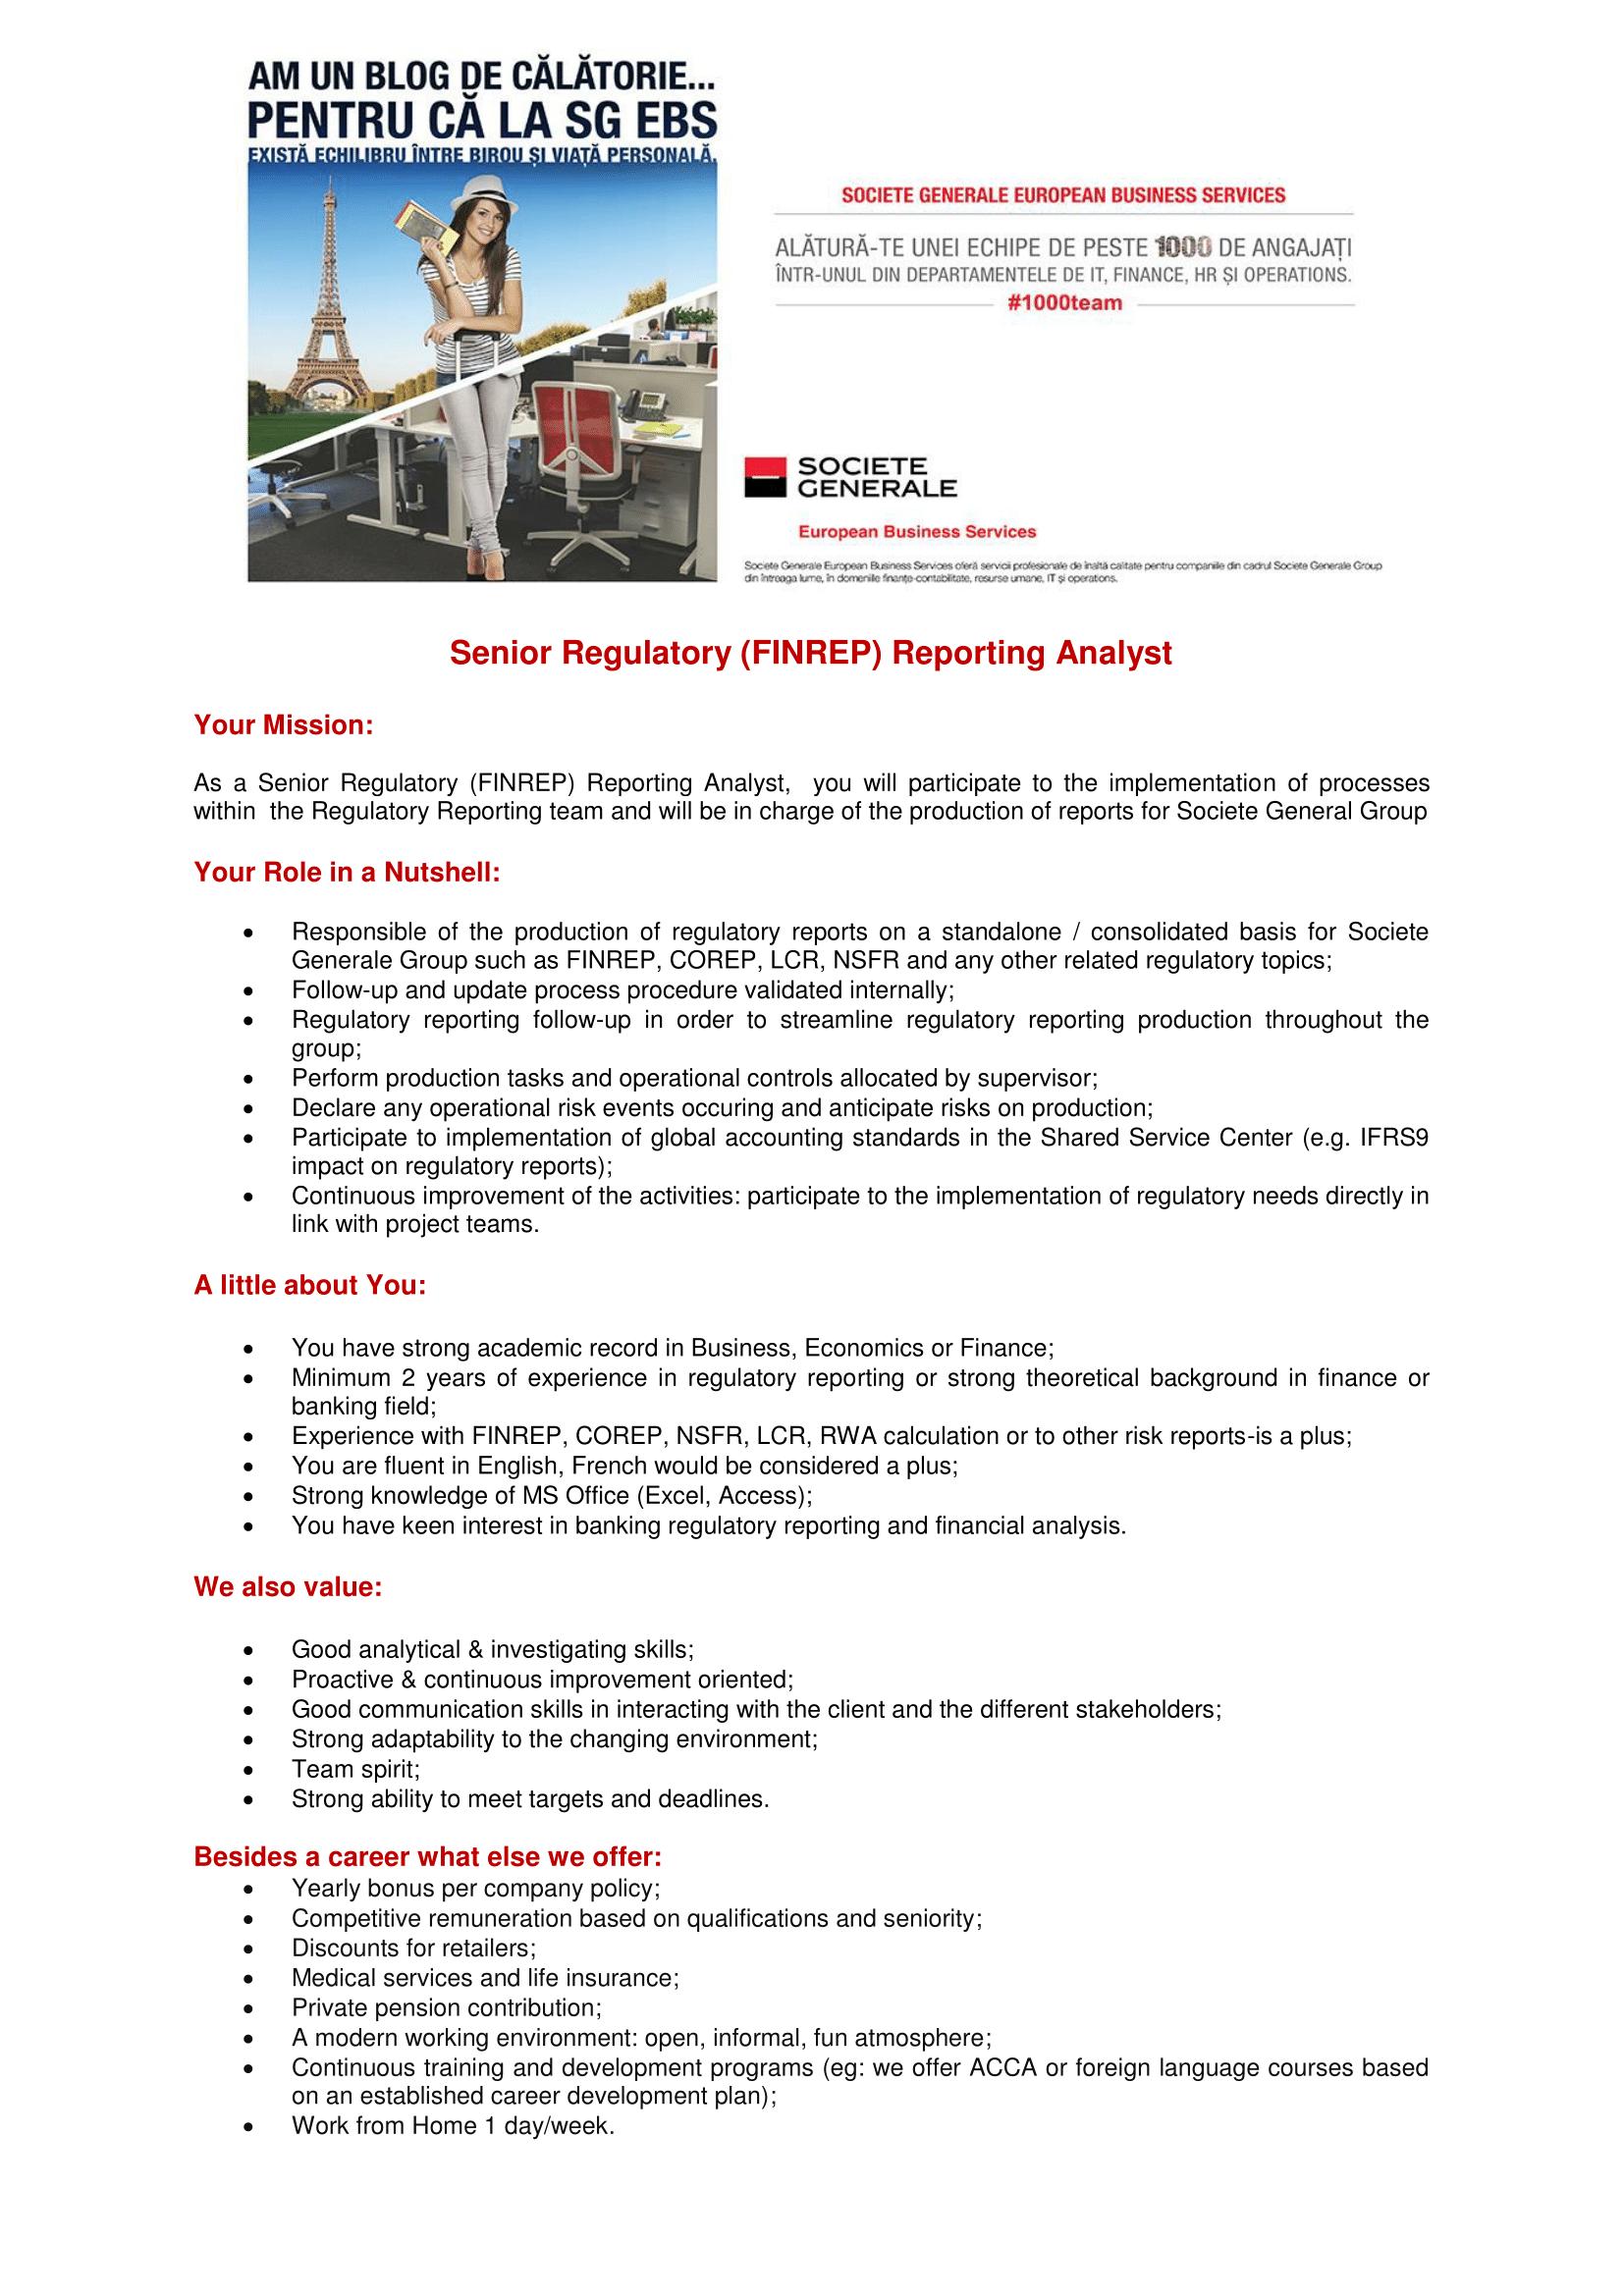 Senior Regulatory (FINREP) Reporting Analyst_SG EBS-1